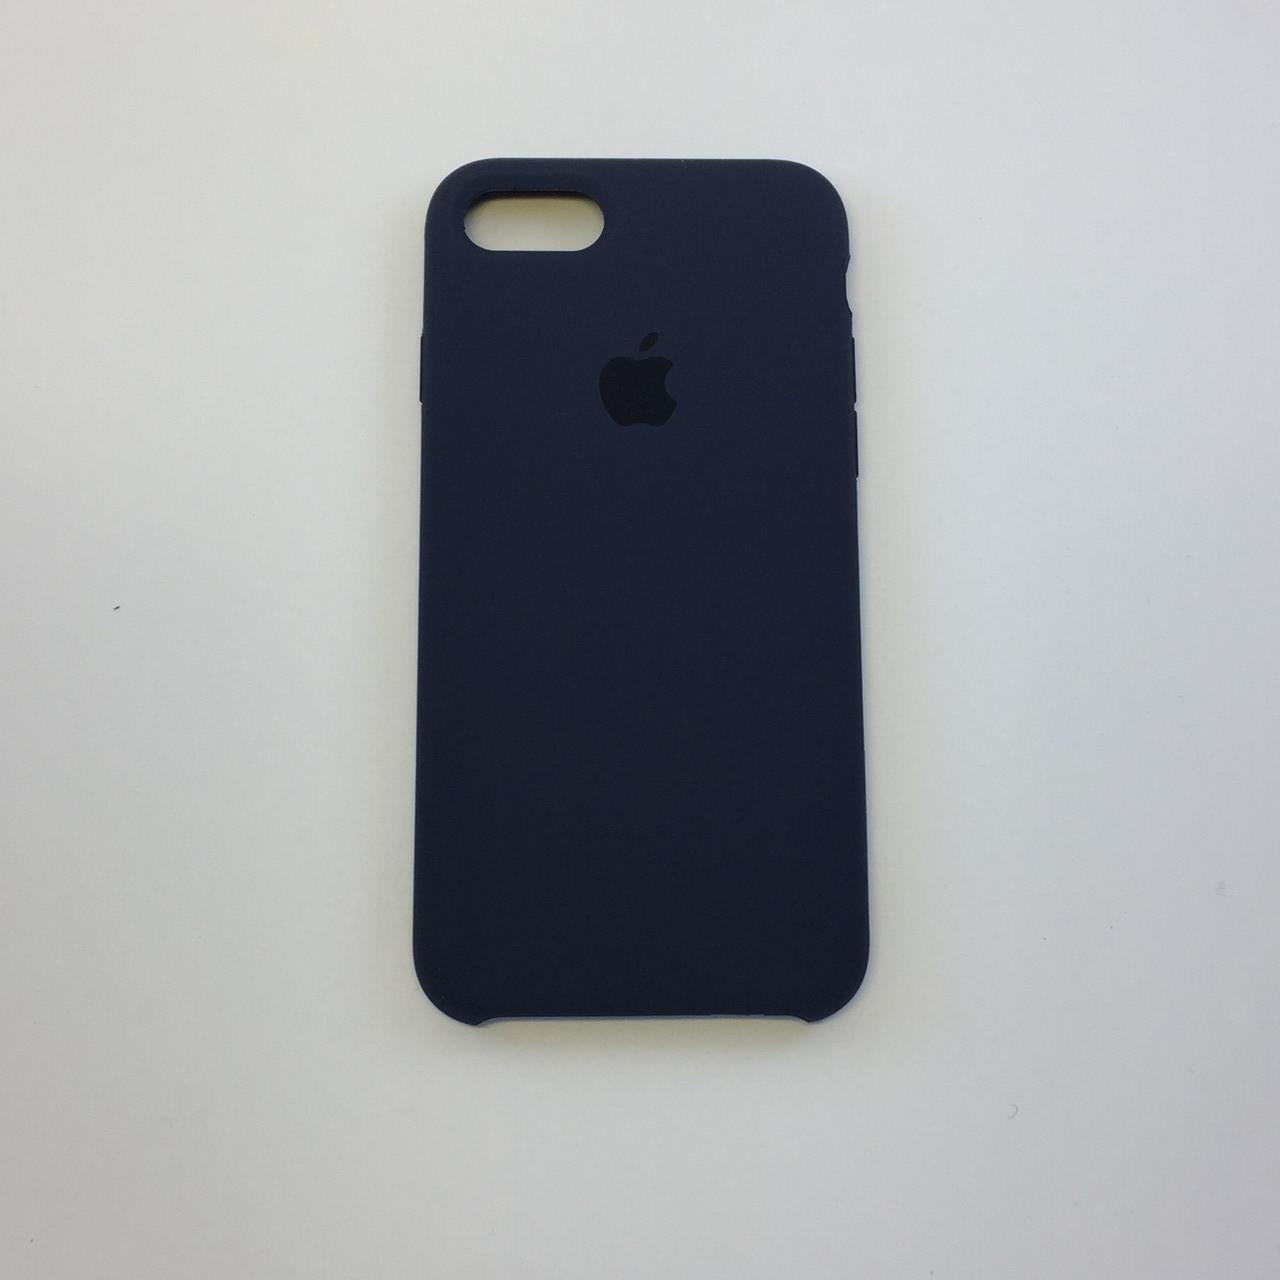 Силиконовый чехол OEM Silicon Case для iPhone 8 Plus, темно-синий